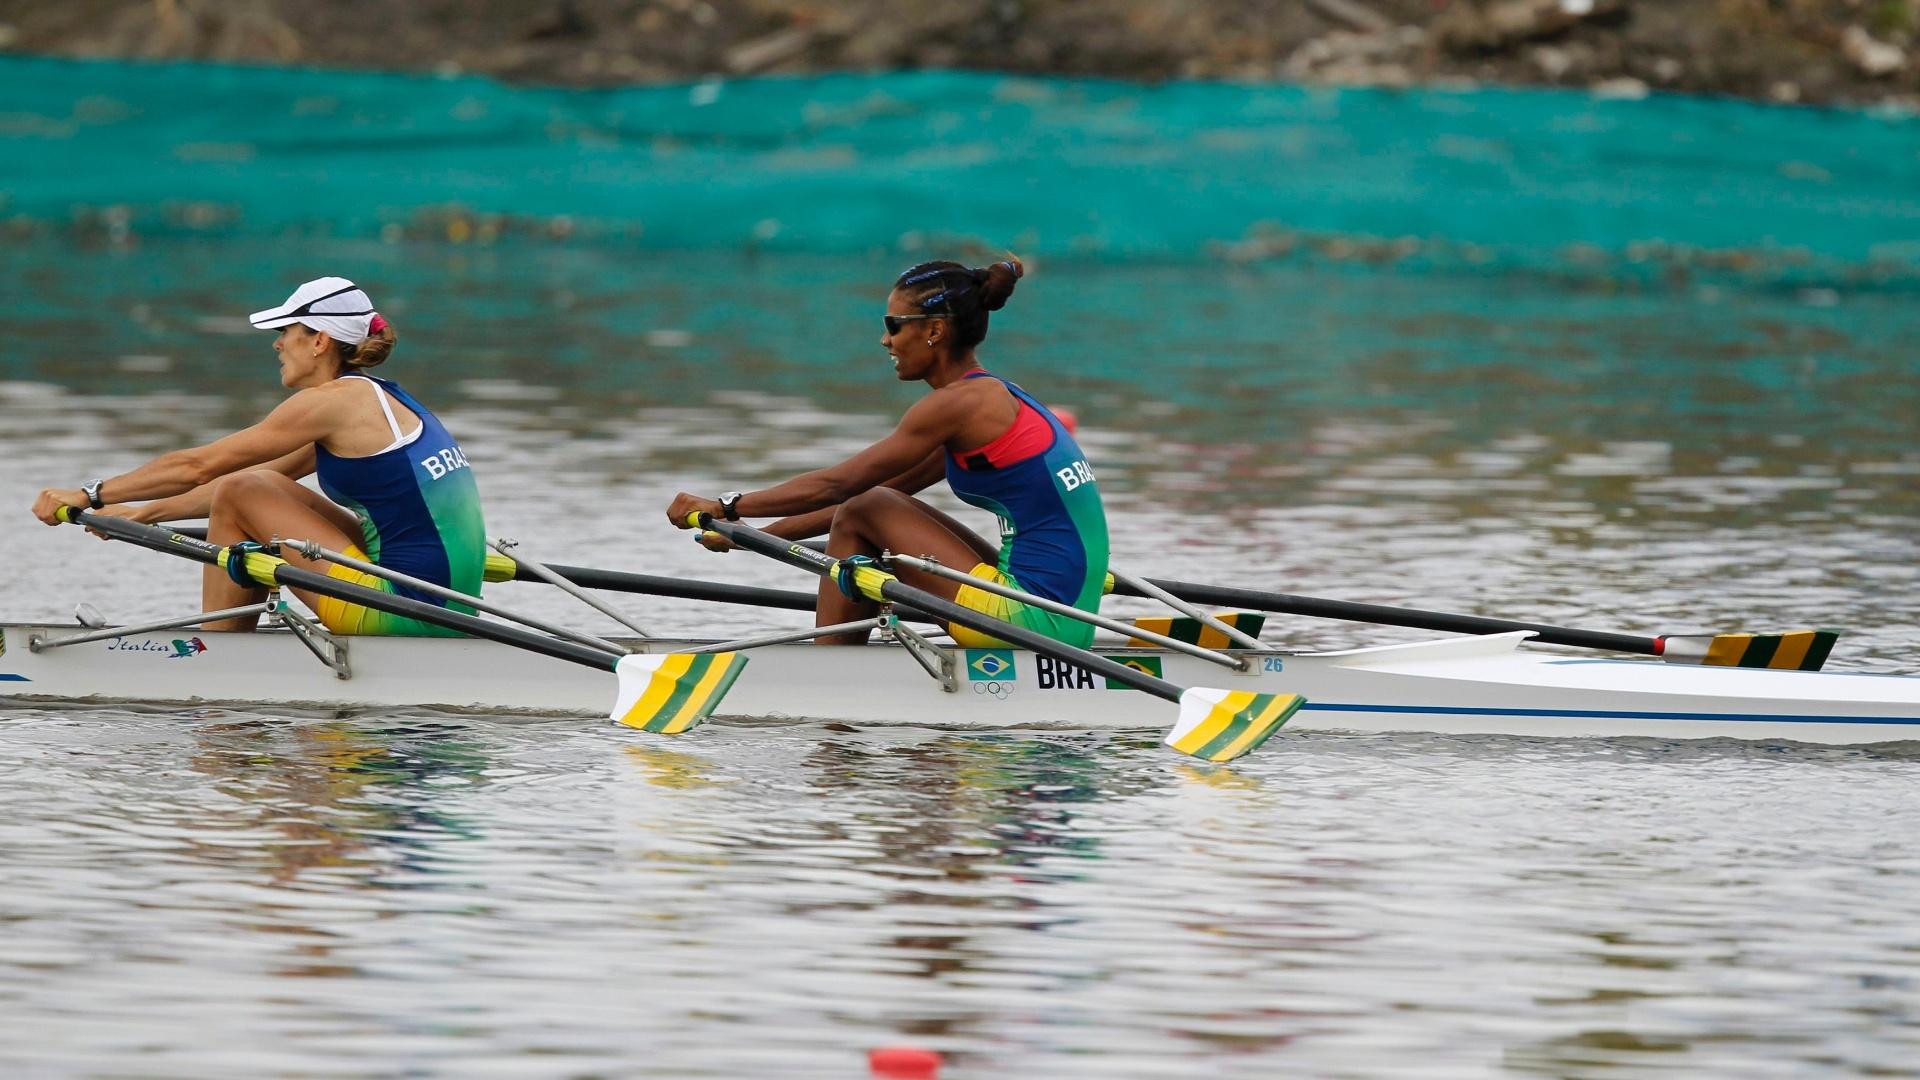 Fabiana Beltrame e Luana Bartholo asseguraram vaga no skiff duplo leve na Olimpíada de Londres